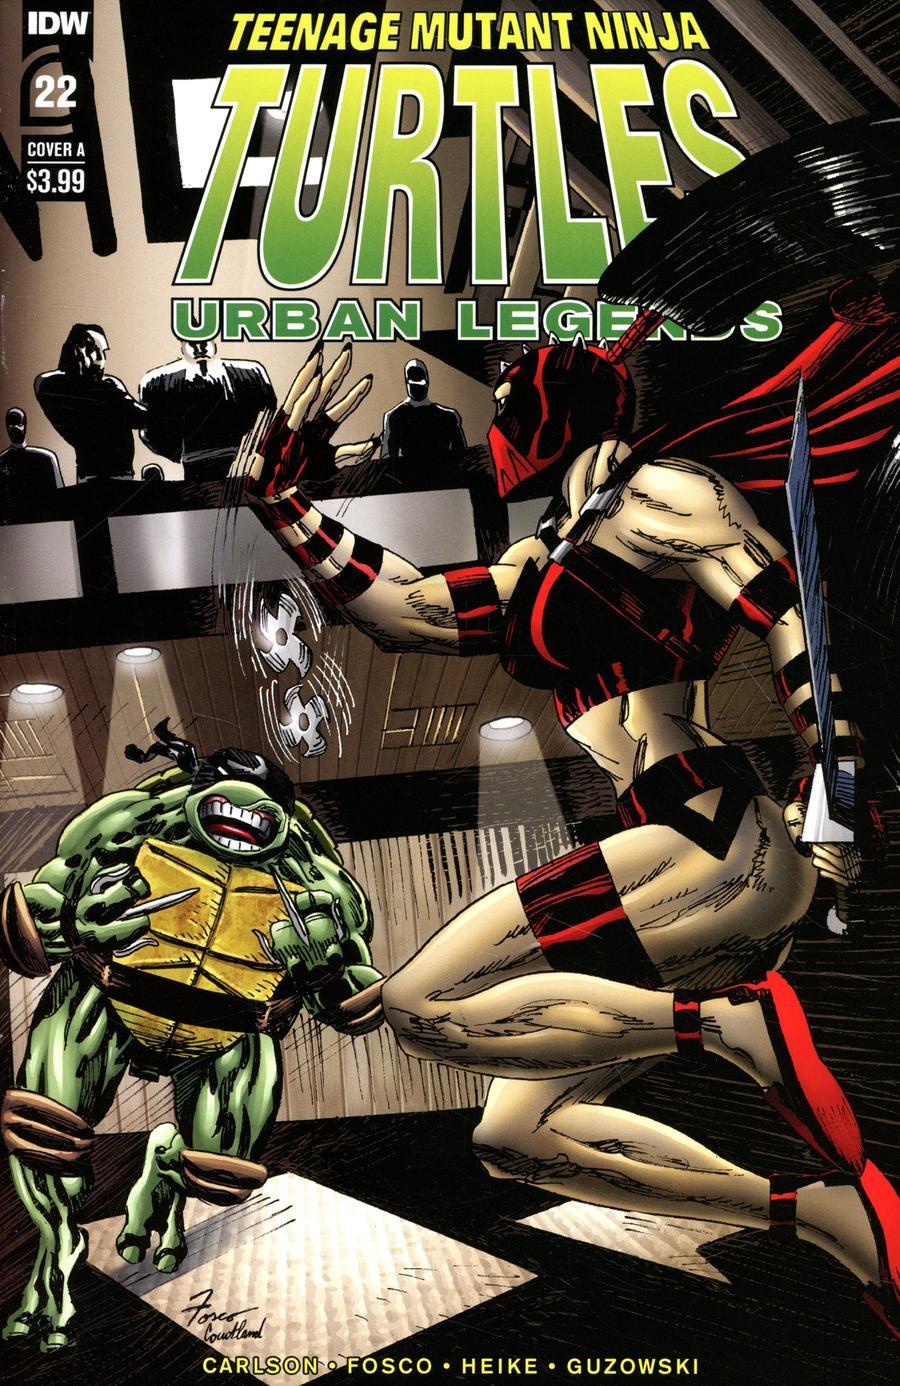 Teenage Mutant Ninja Turtles Urban Legends #22 Cover A Regular Frank Fosco Cover